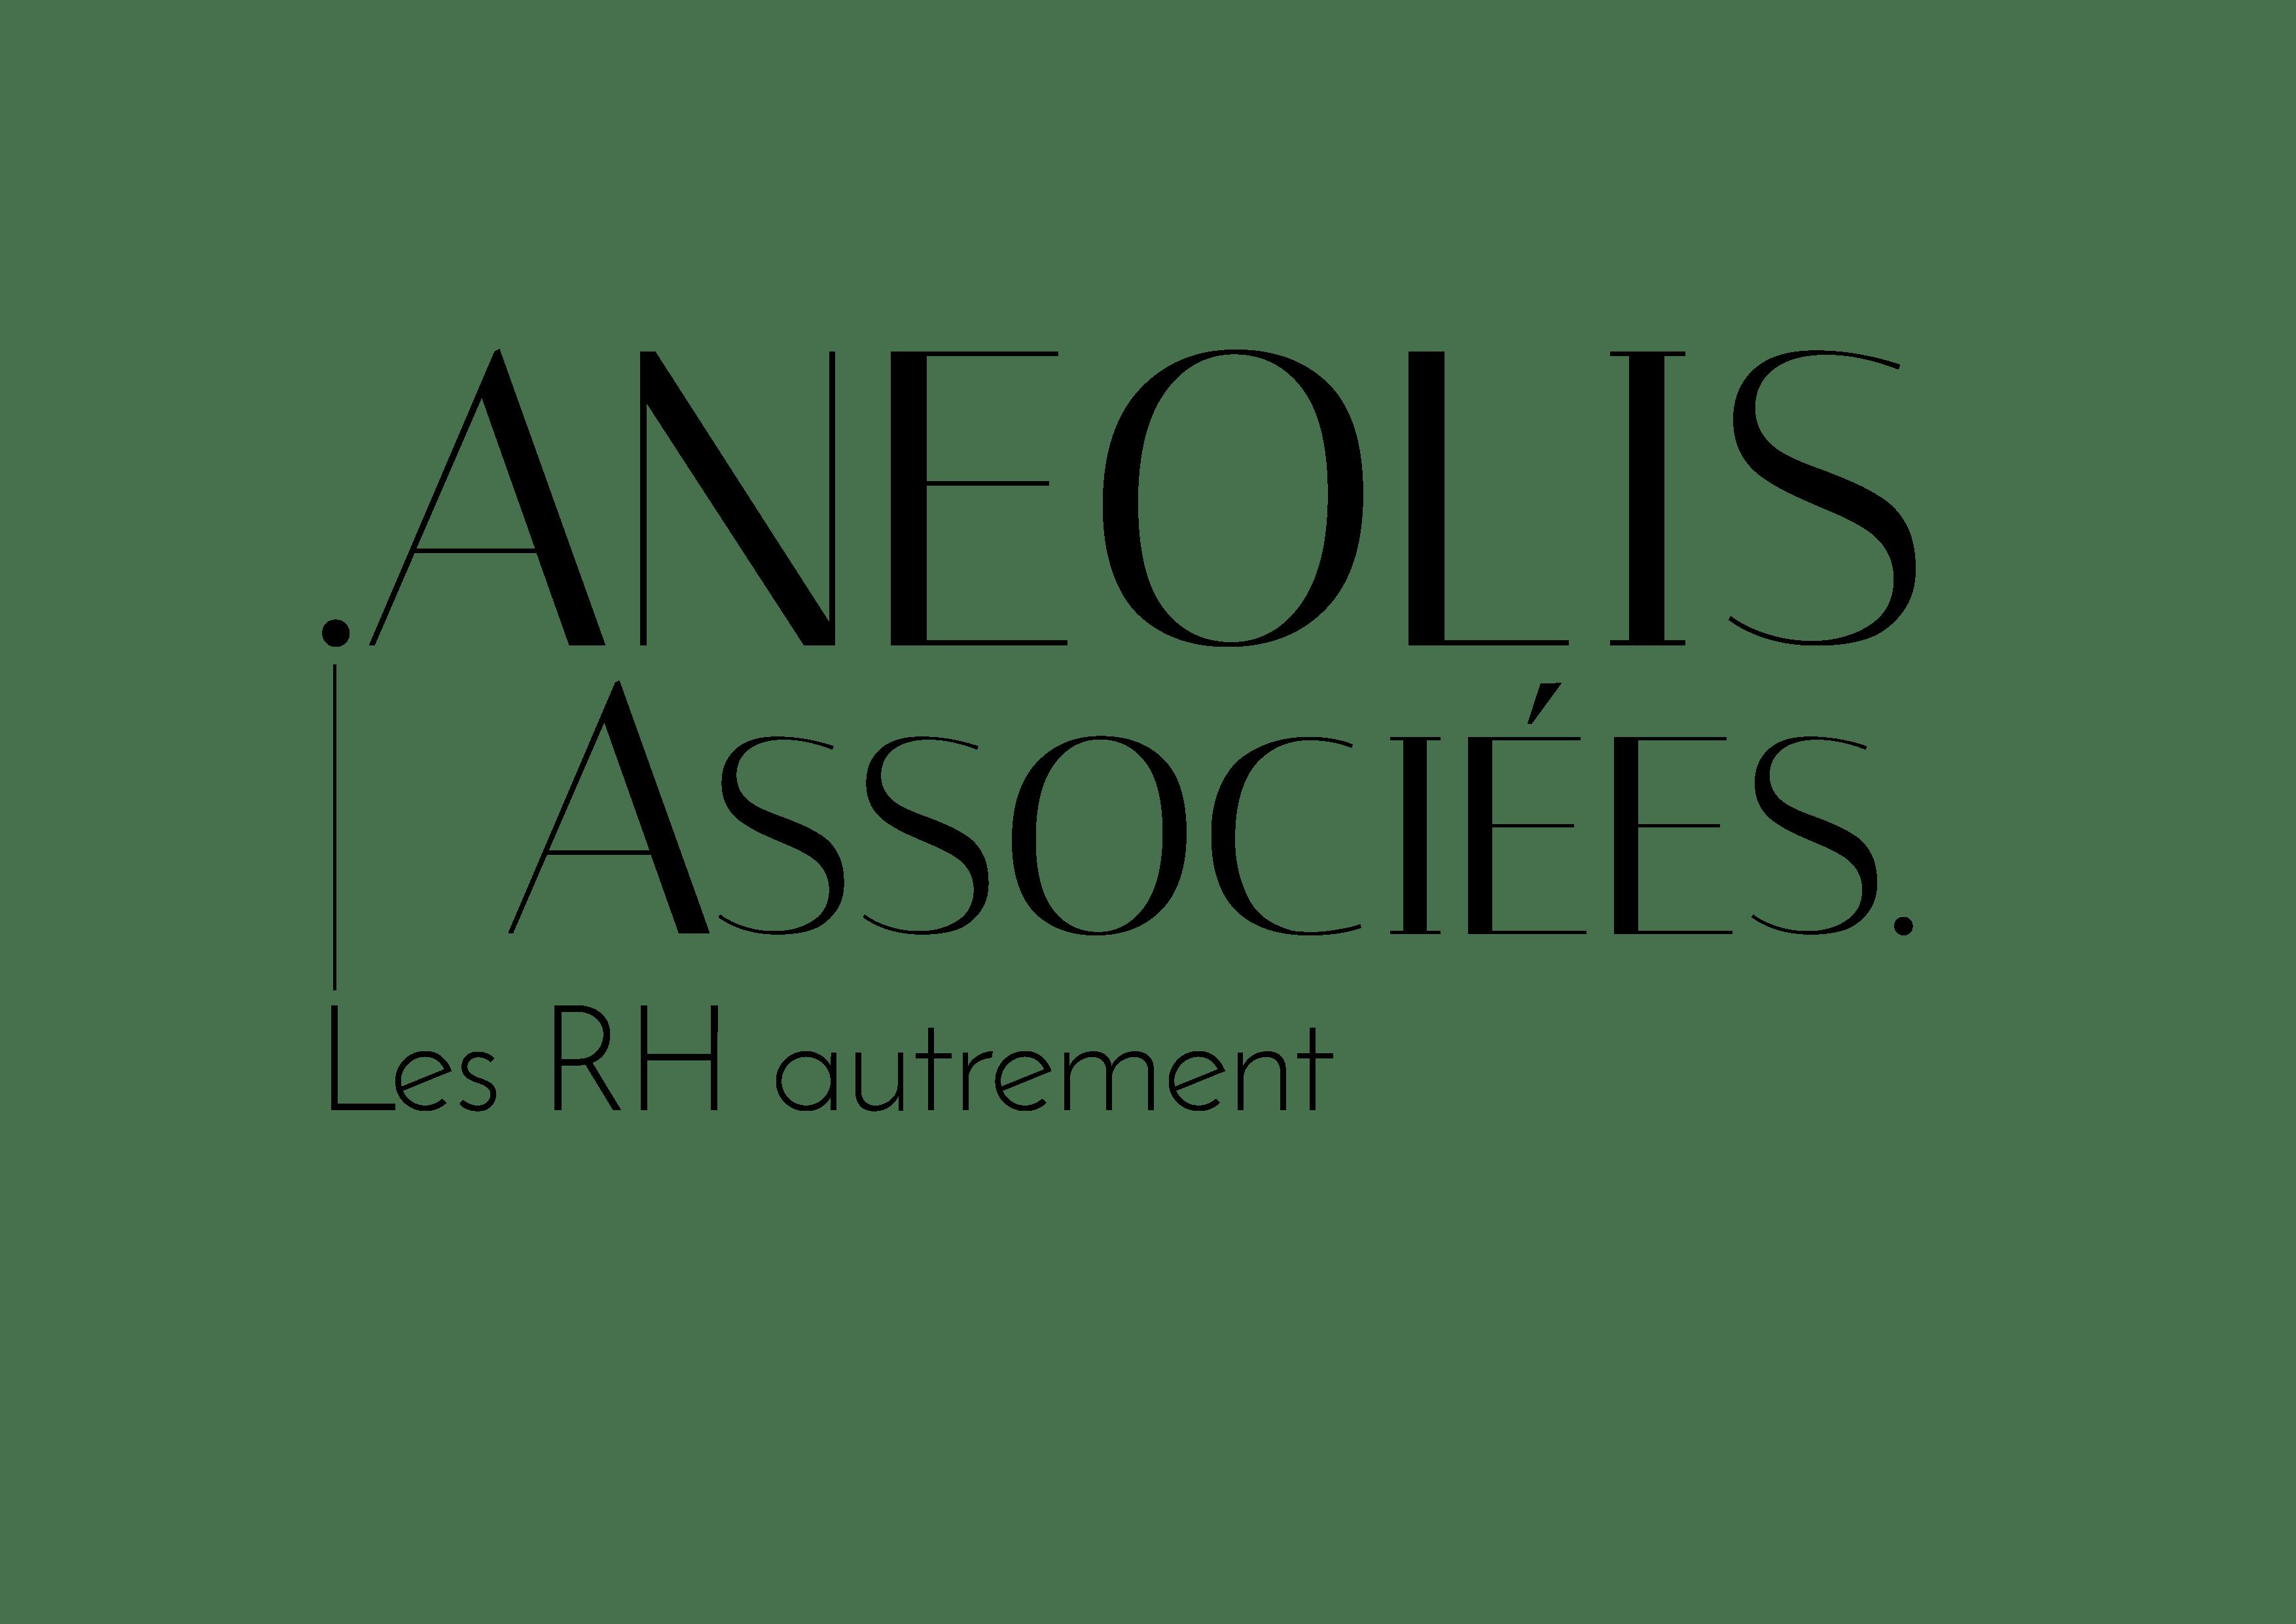 ANEOLIS ASSOCIÉES